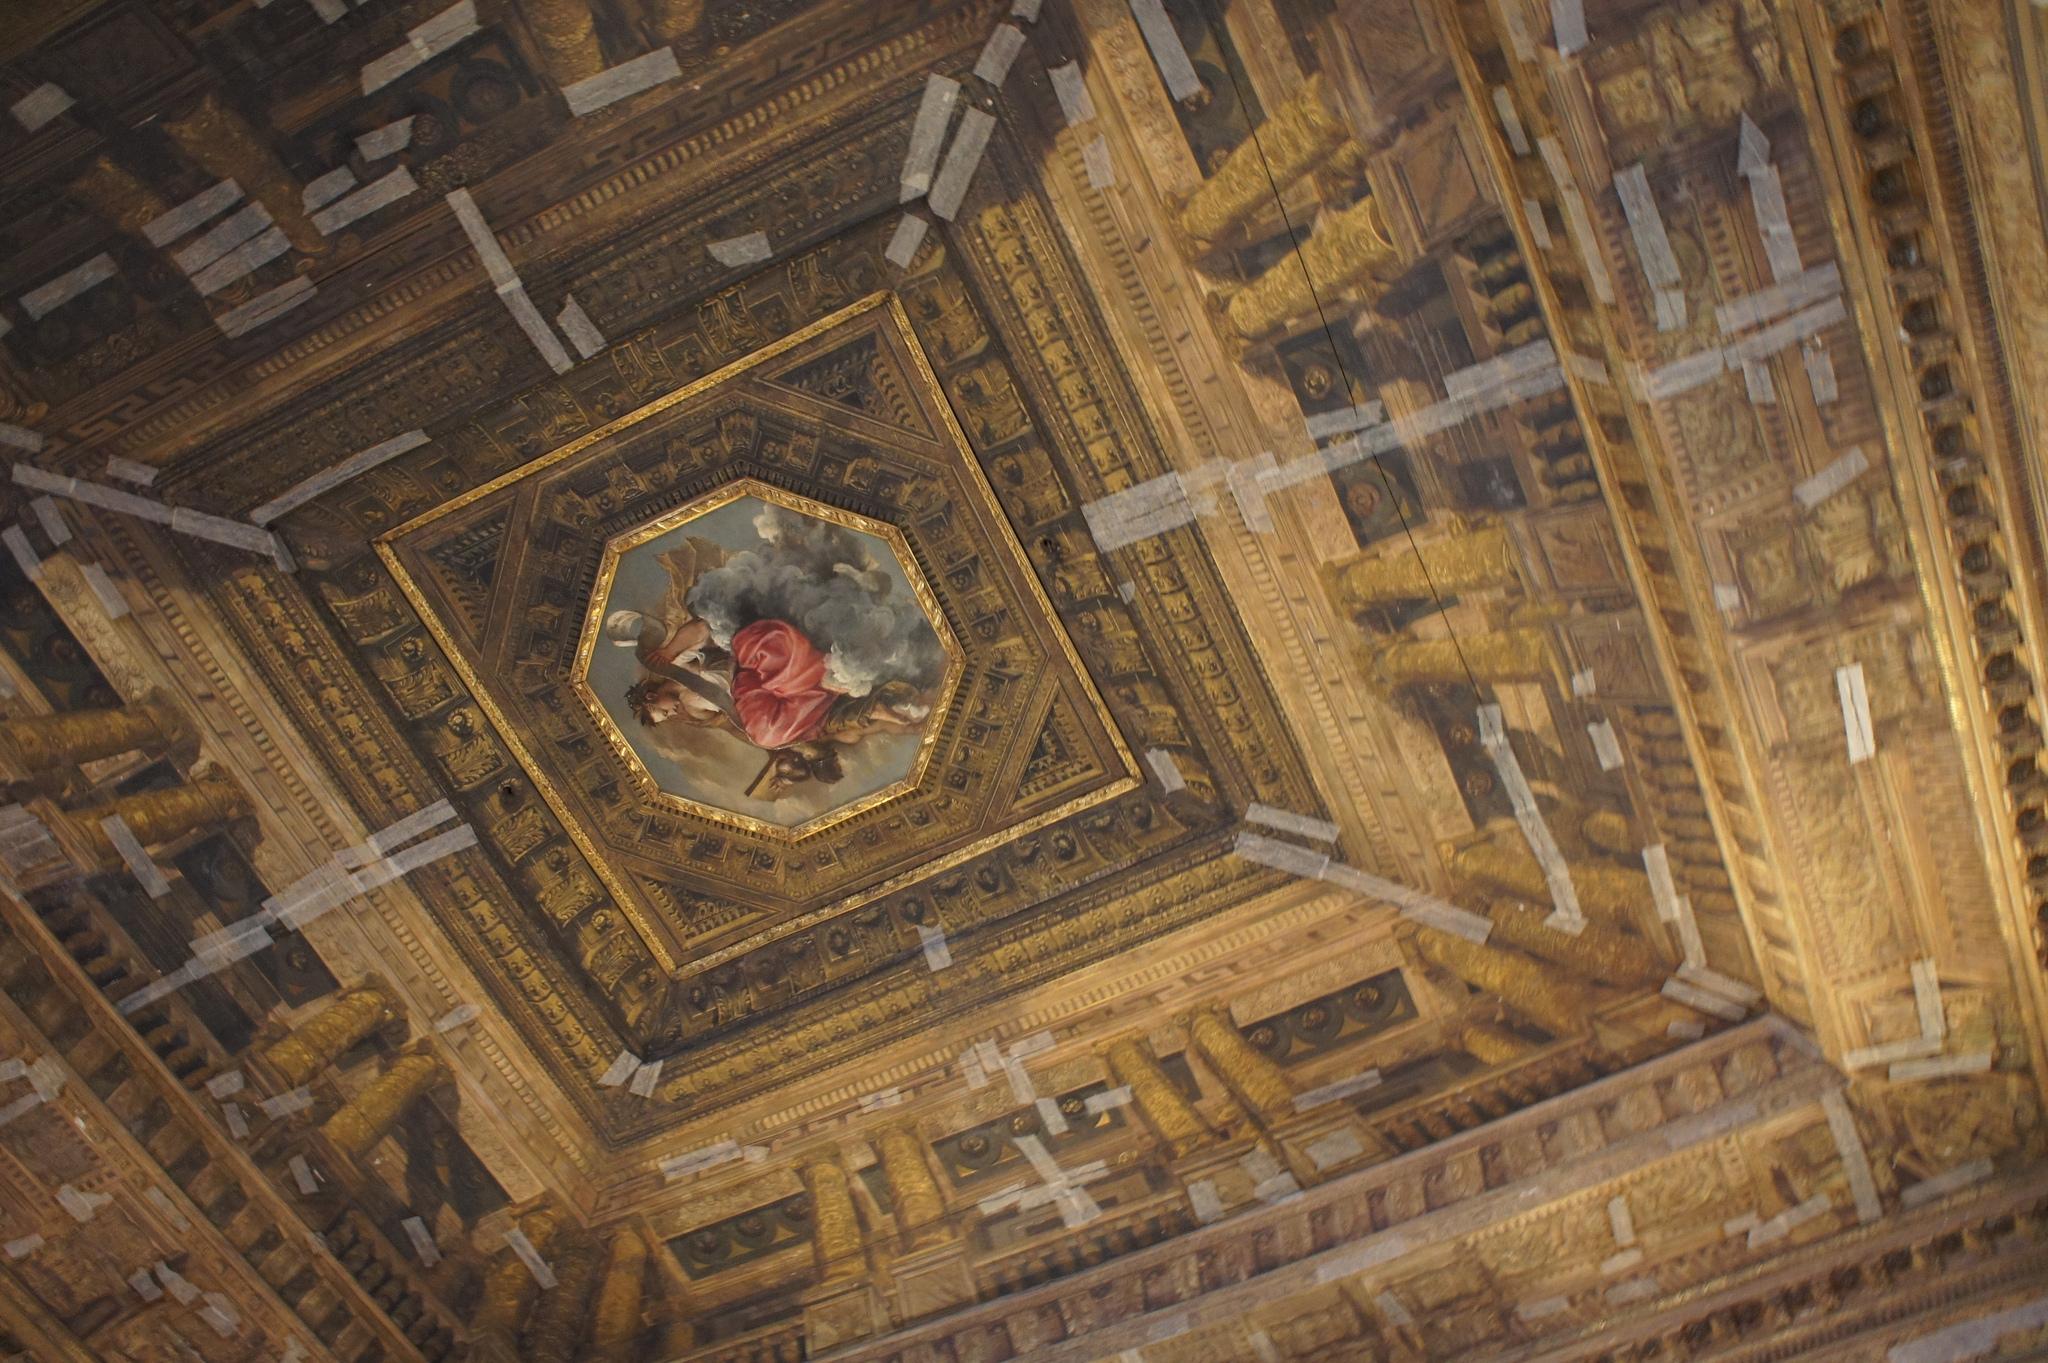 Библиотека Марчиана, потолки